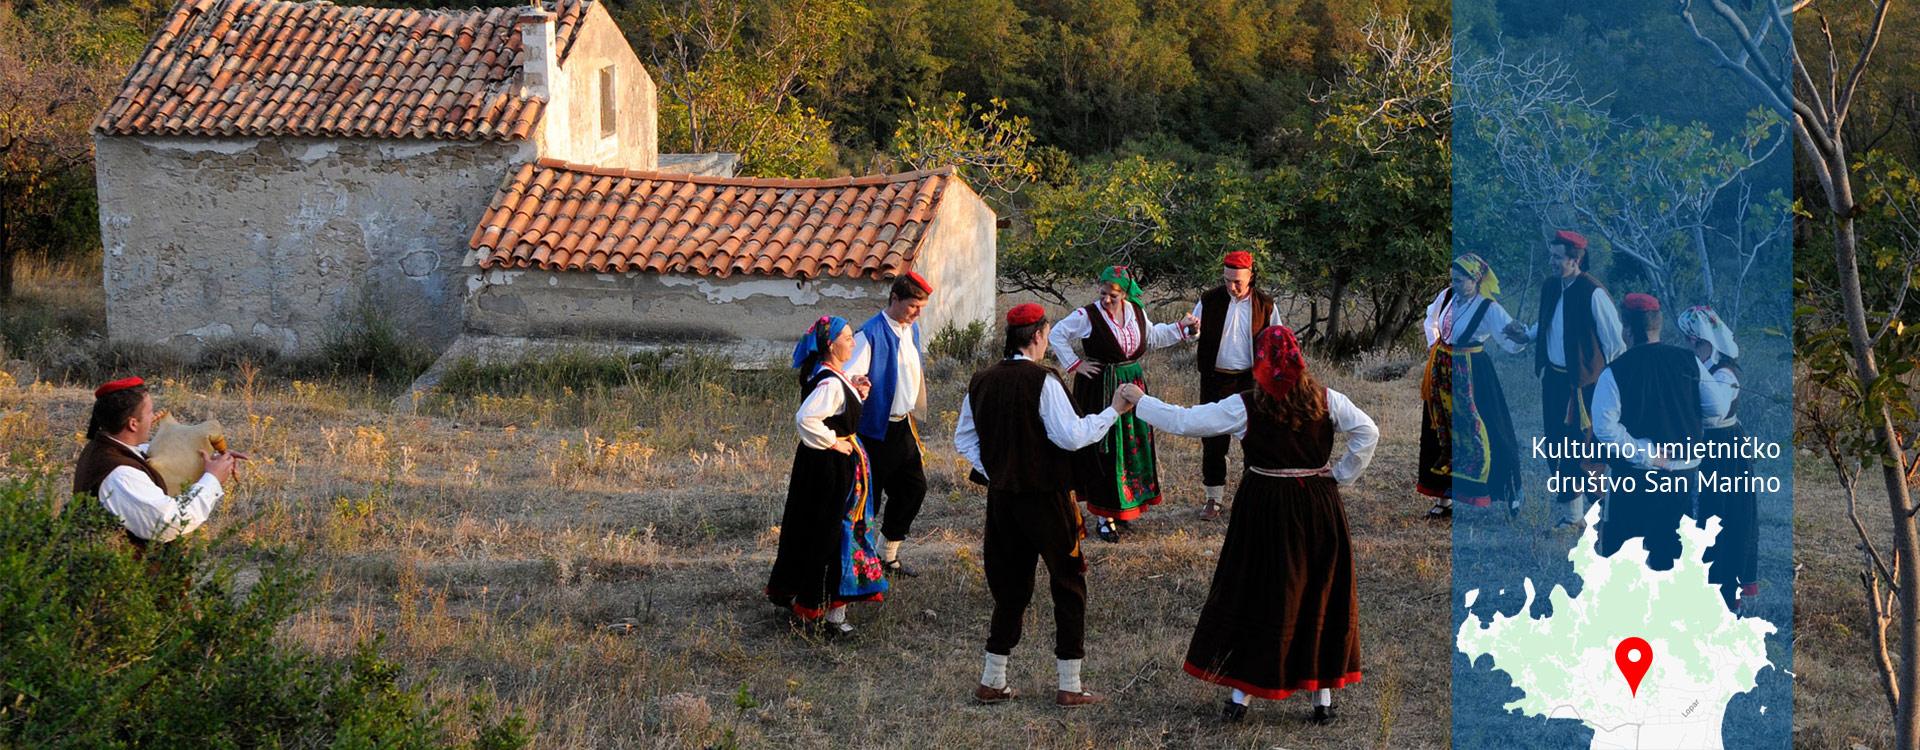 Općina Lopar - KUD San Marino